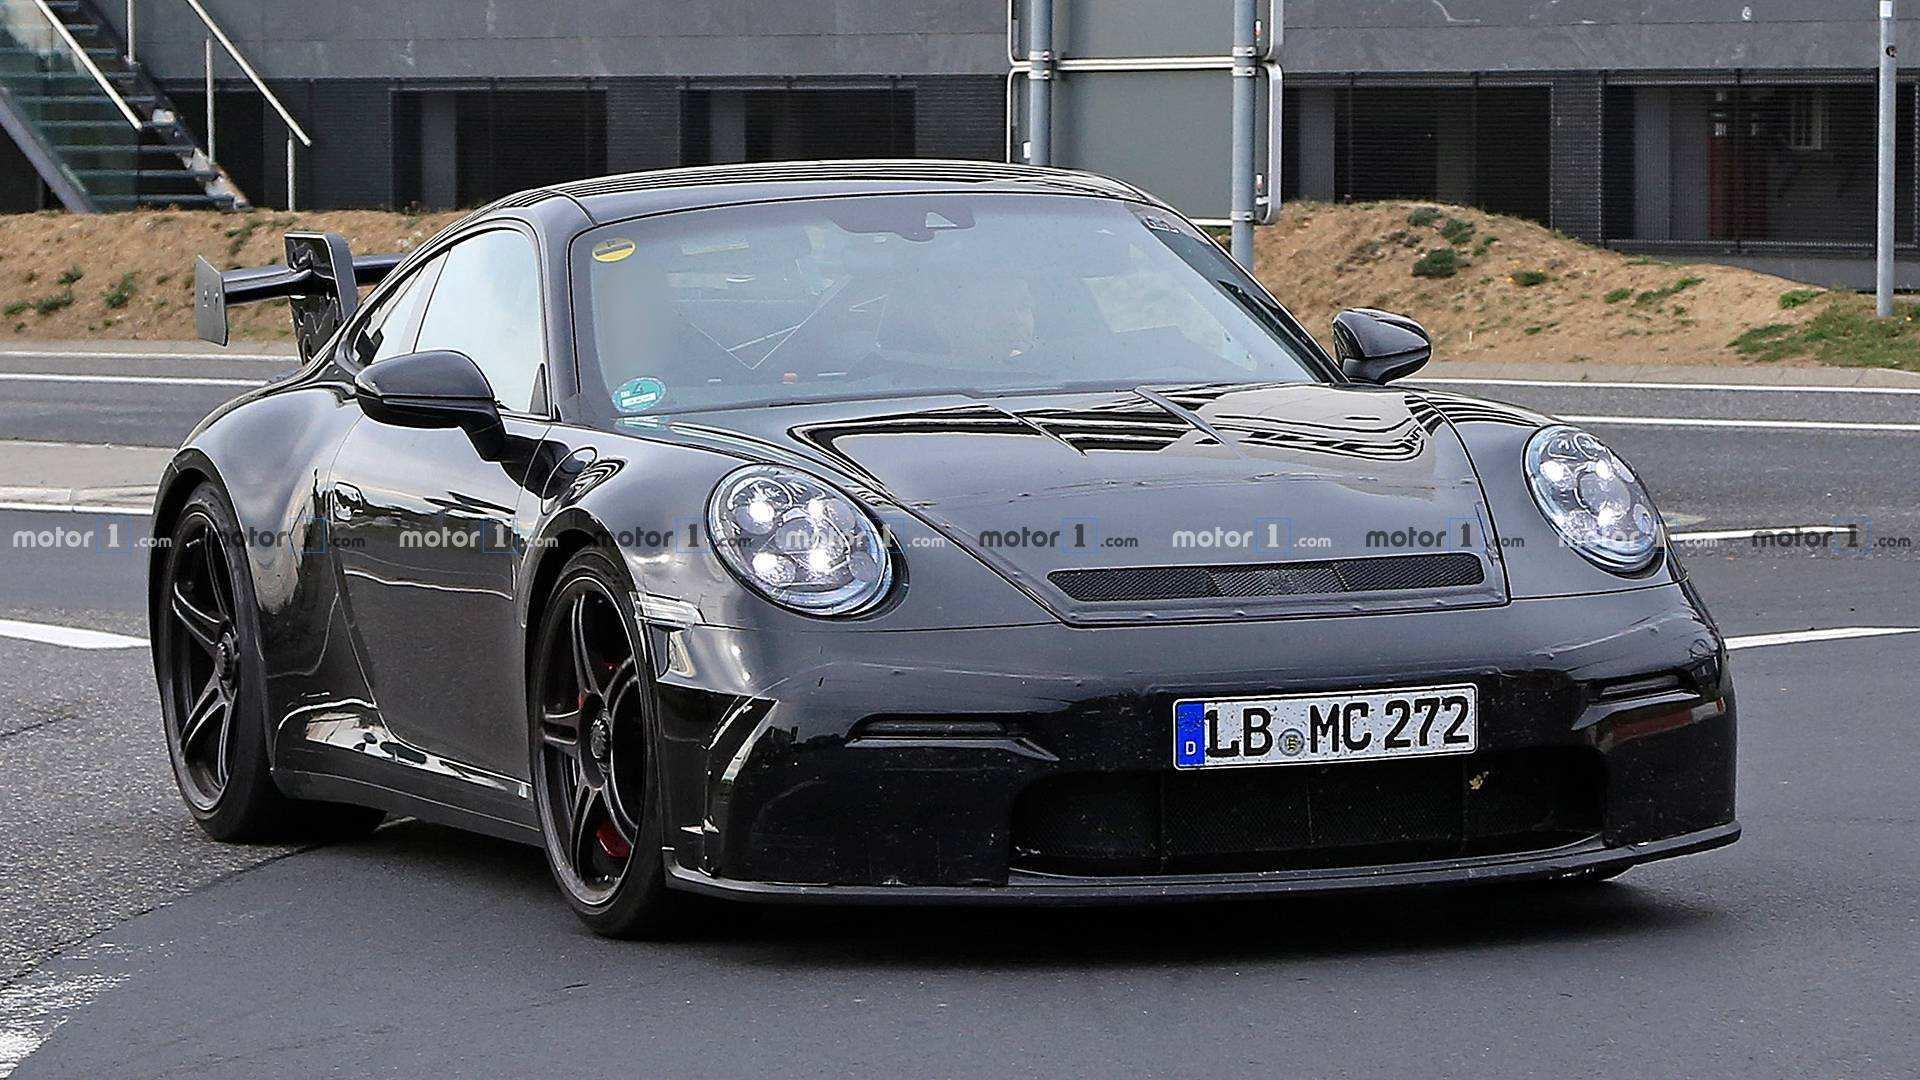 78 All New 2020 Porsche 911 Gt3 Picture for 2020 Porsche 911 Gt3